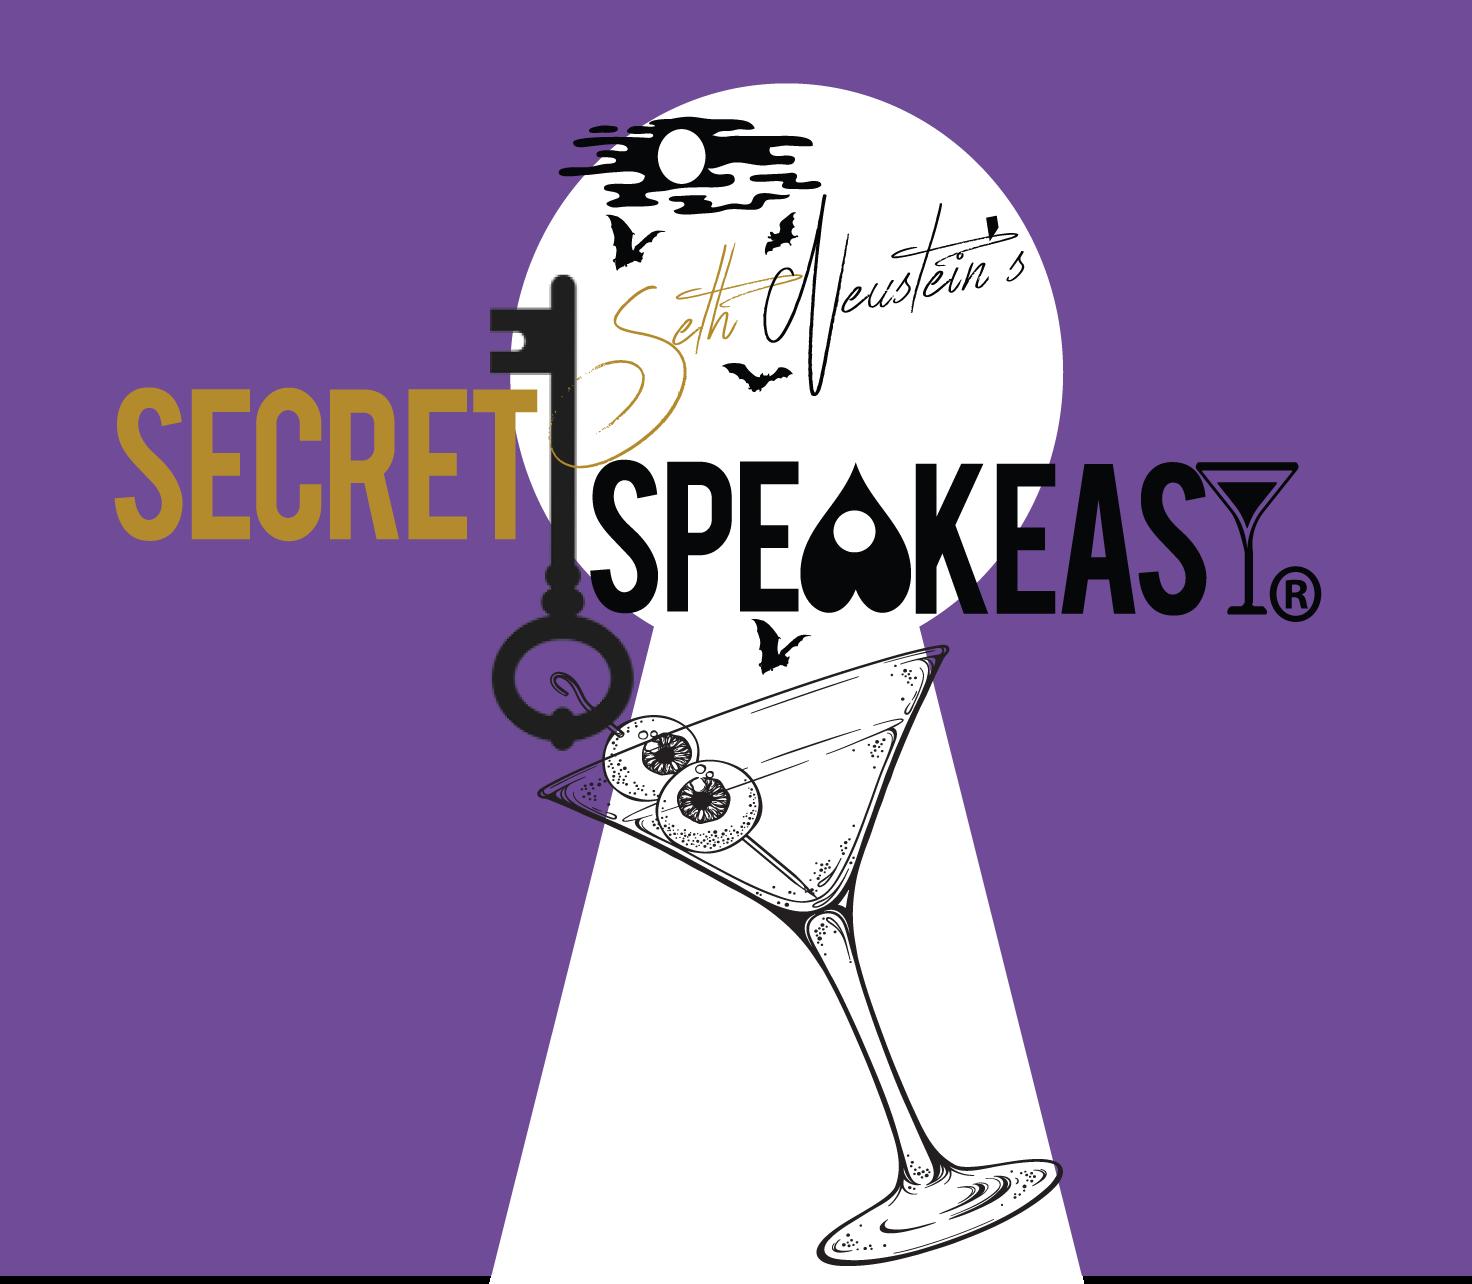 Seth Neustein - Magician and Mentalist - Secret Speakeasy - Great American Speakeasy - Skeptic Seance Pittsburgh